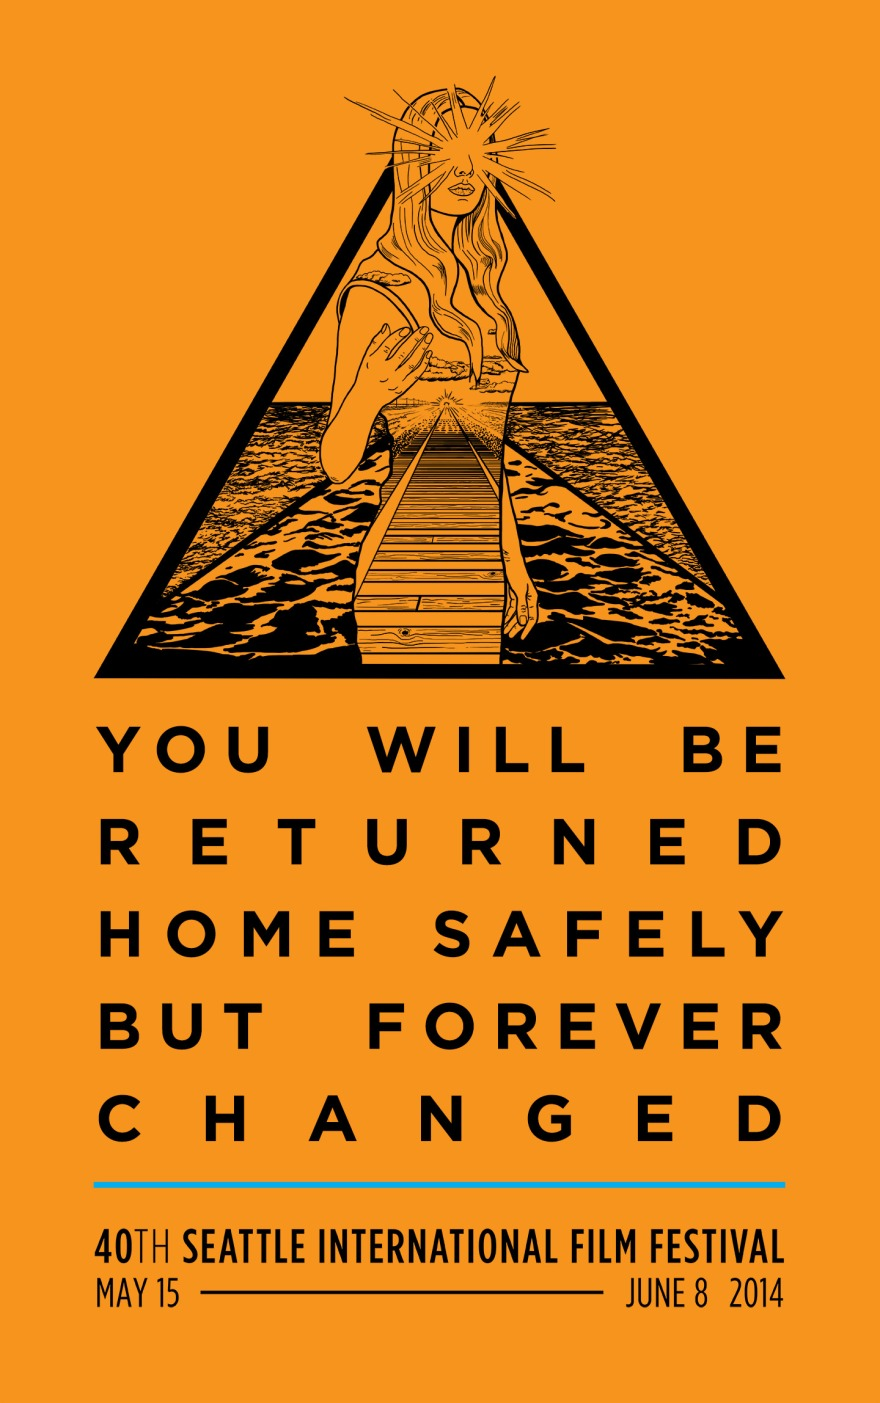 Seattle International Film Festival T-Shirt Illustration